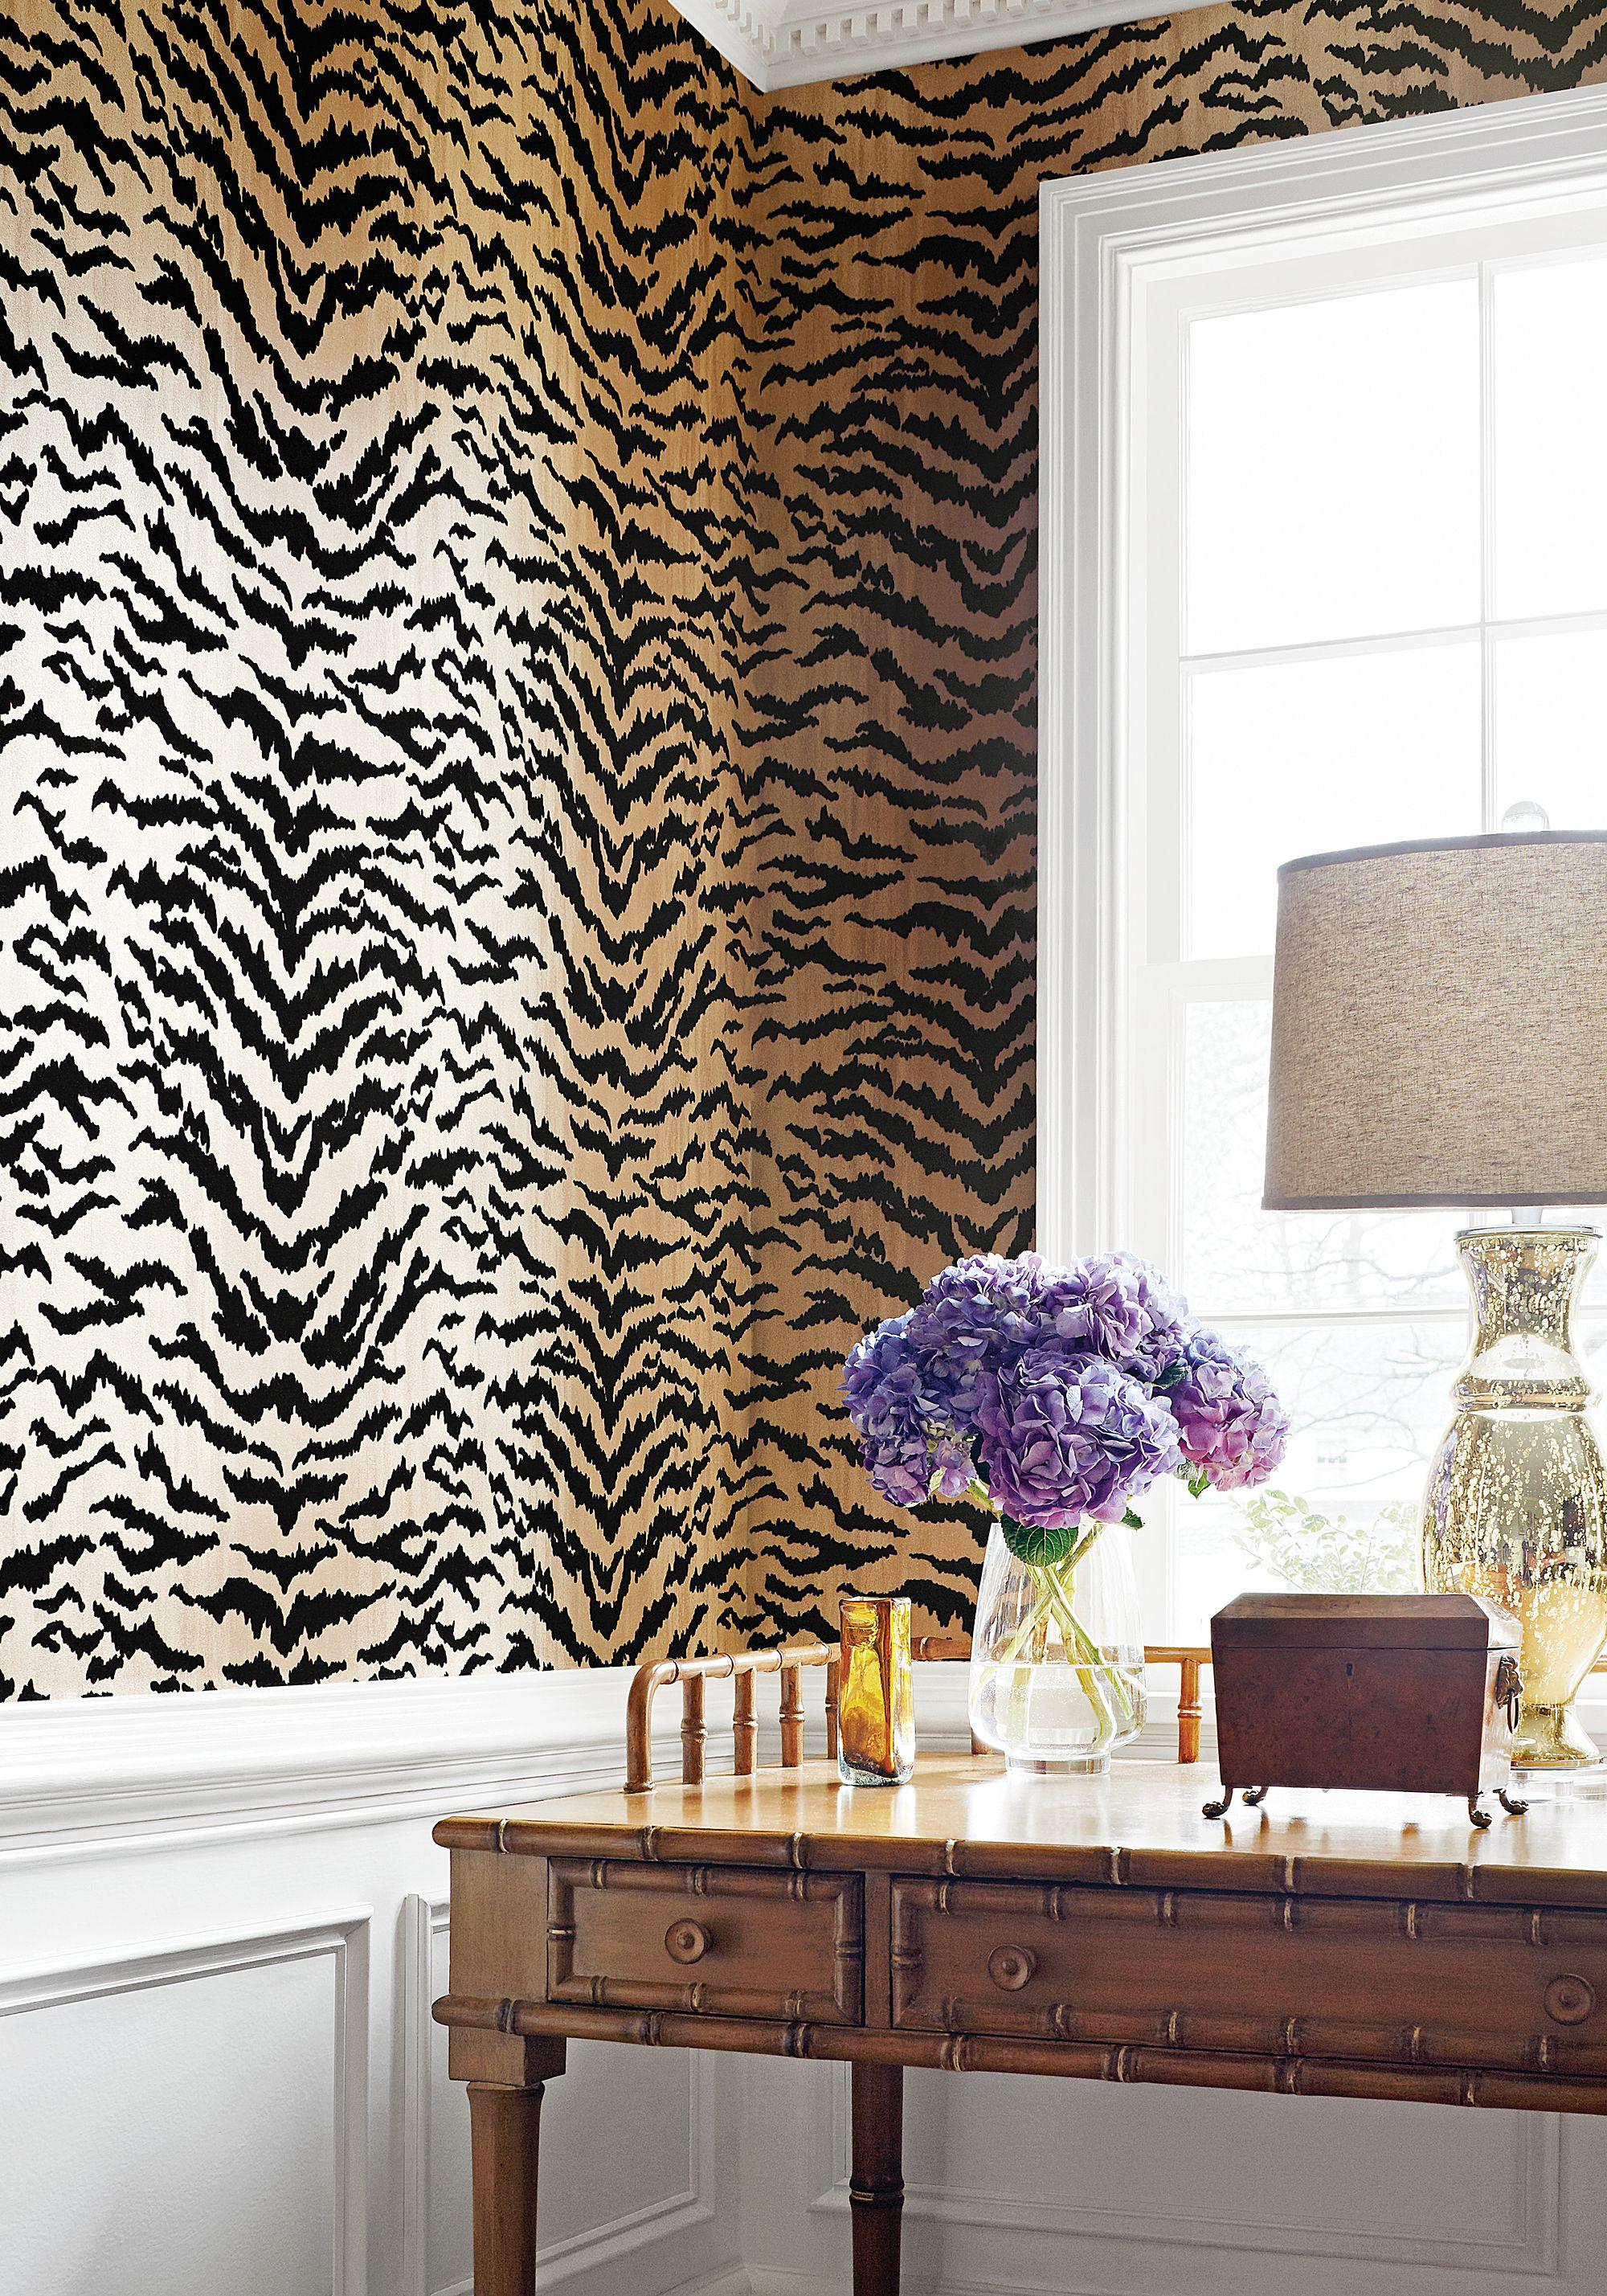 Shop Room Ideas Cheap Home Decor Trending Ideas Animal Print Furniture Animal Print Wallpaper Animal Print Decor